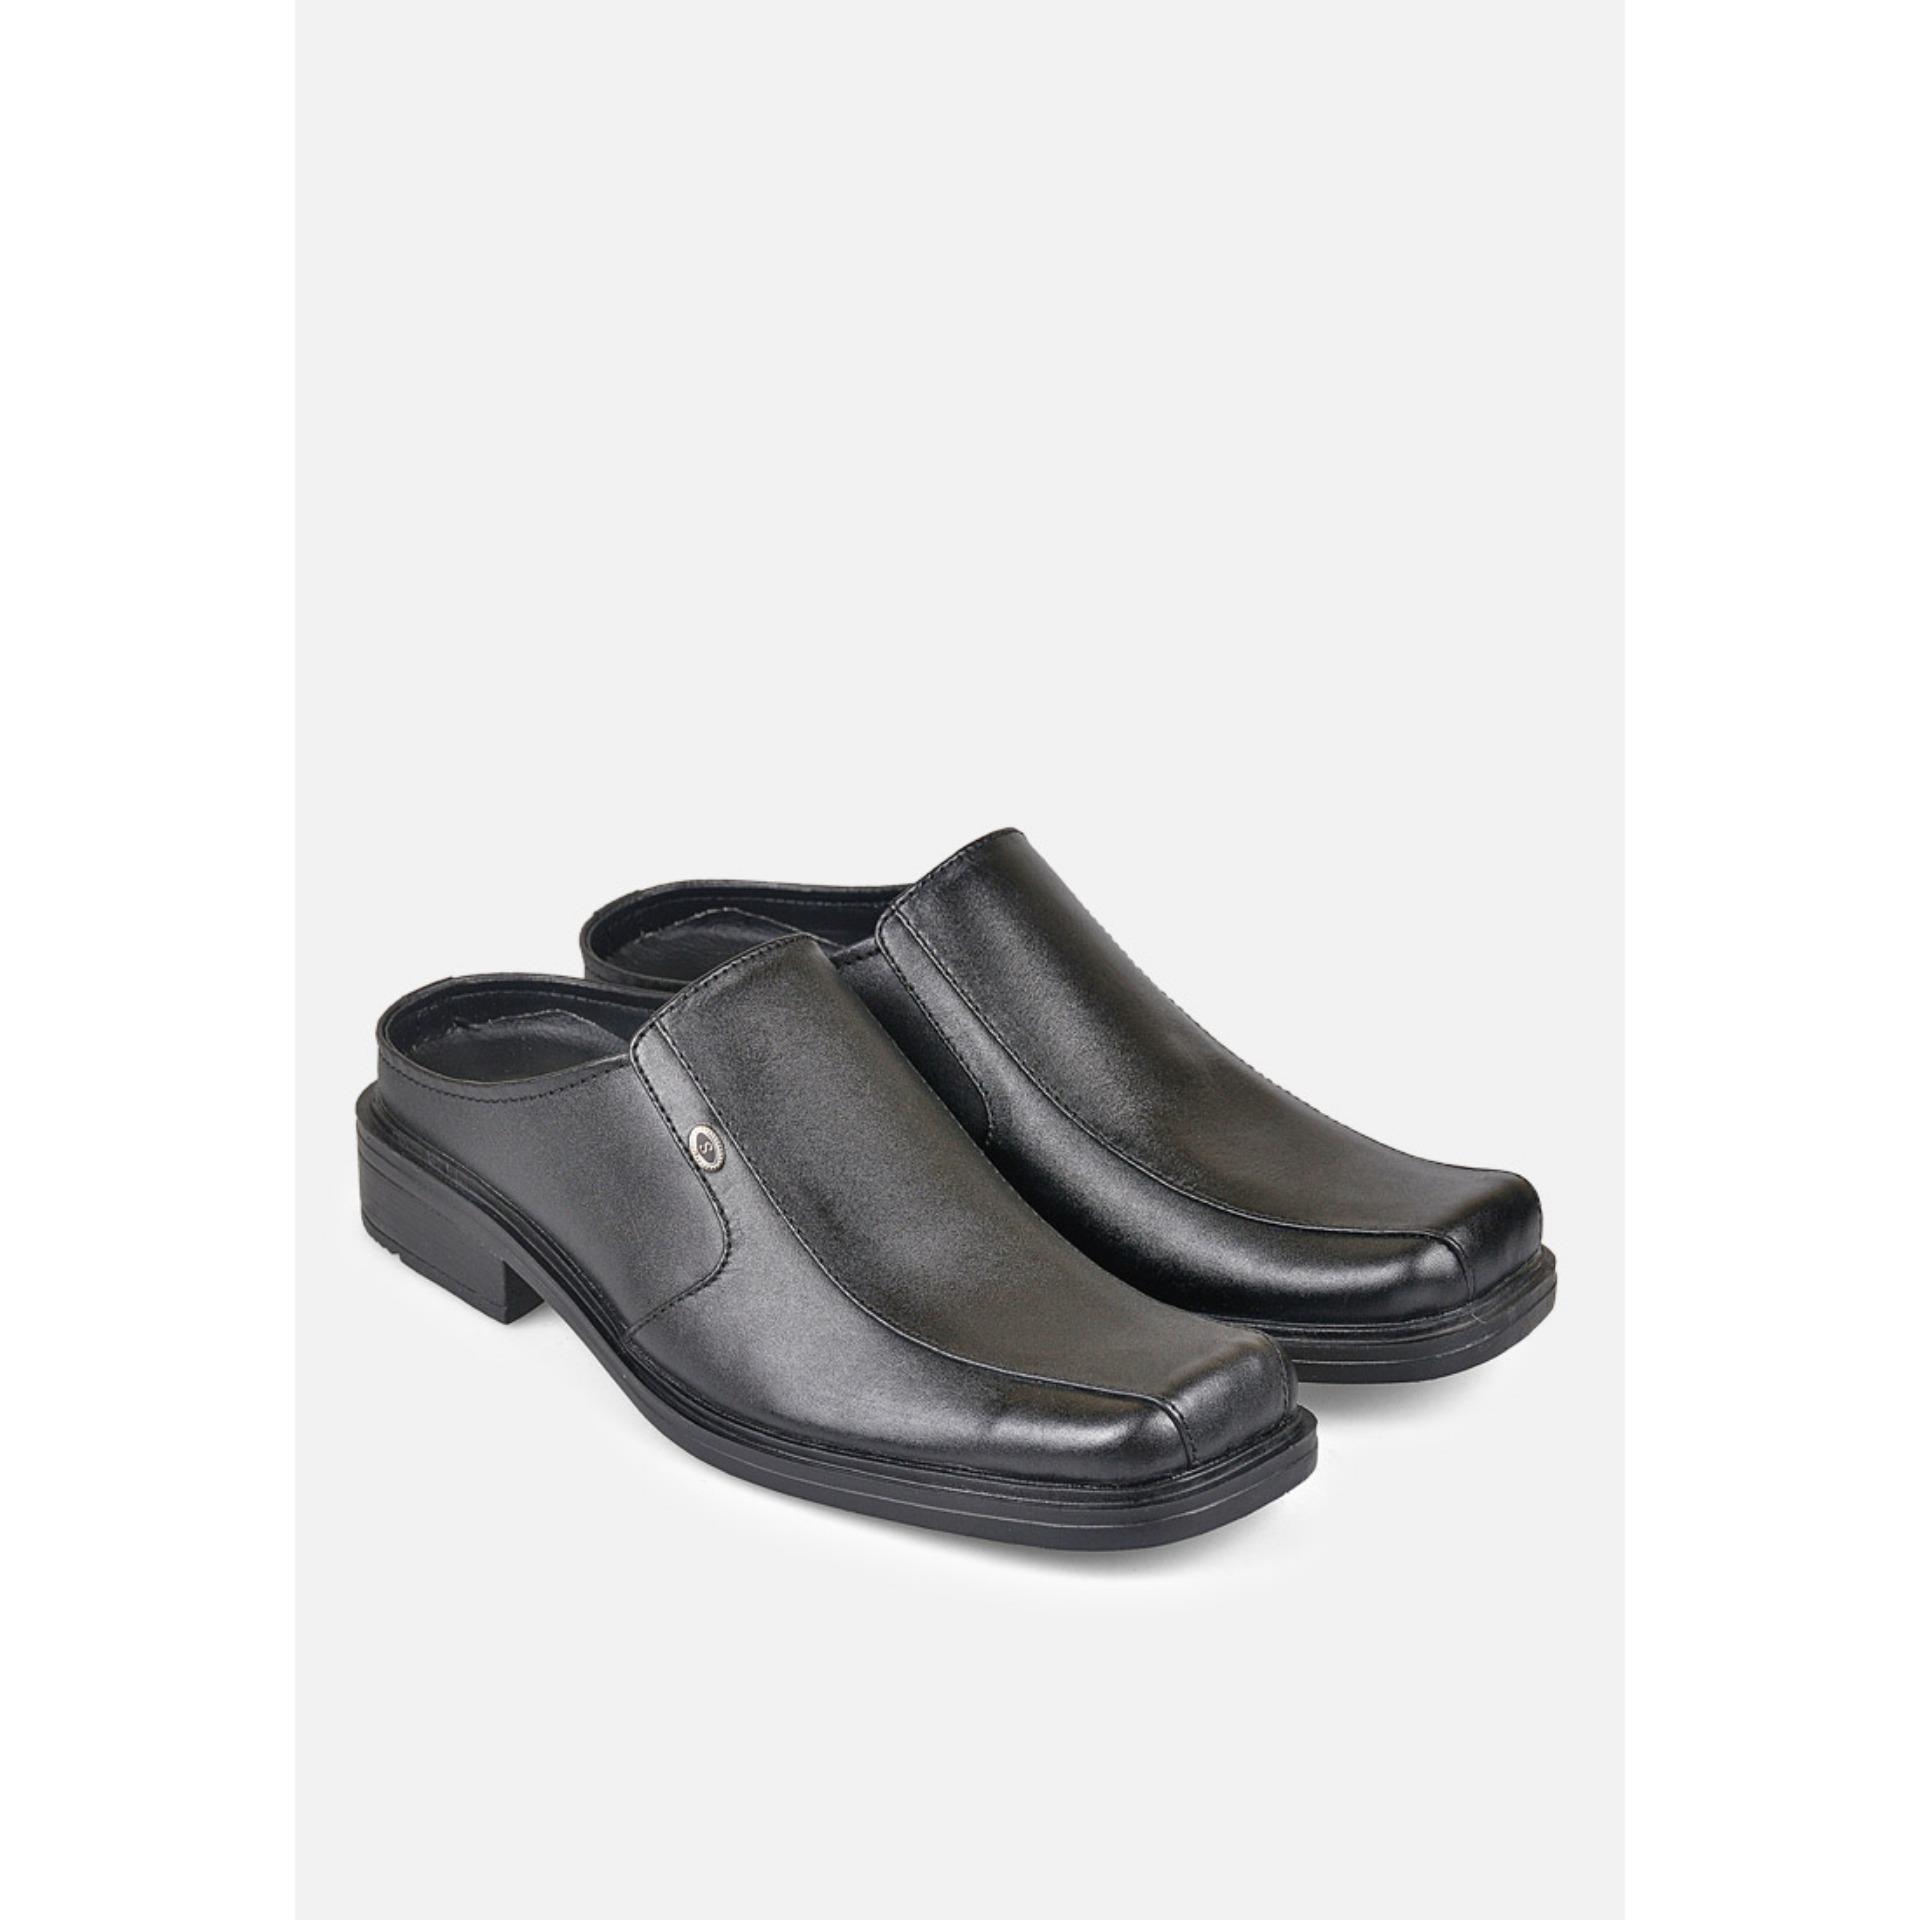 Garucci Sepatu Slop Casual Pria Kulit Asli Gaw 0289 Hitam Spec Dan Gda 9070 Anak Laki Sintetis Keren Update Source